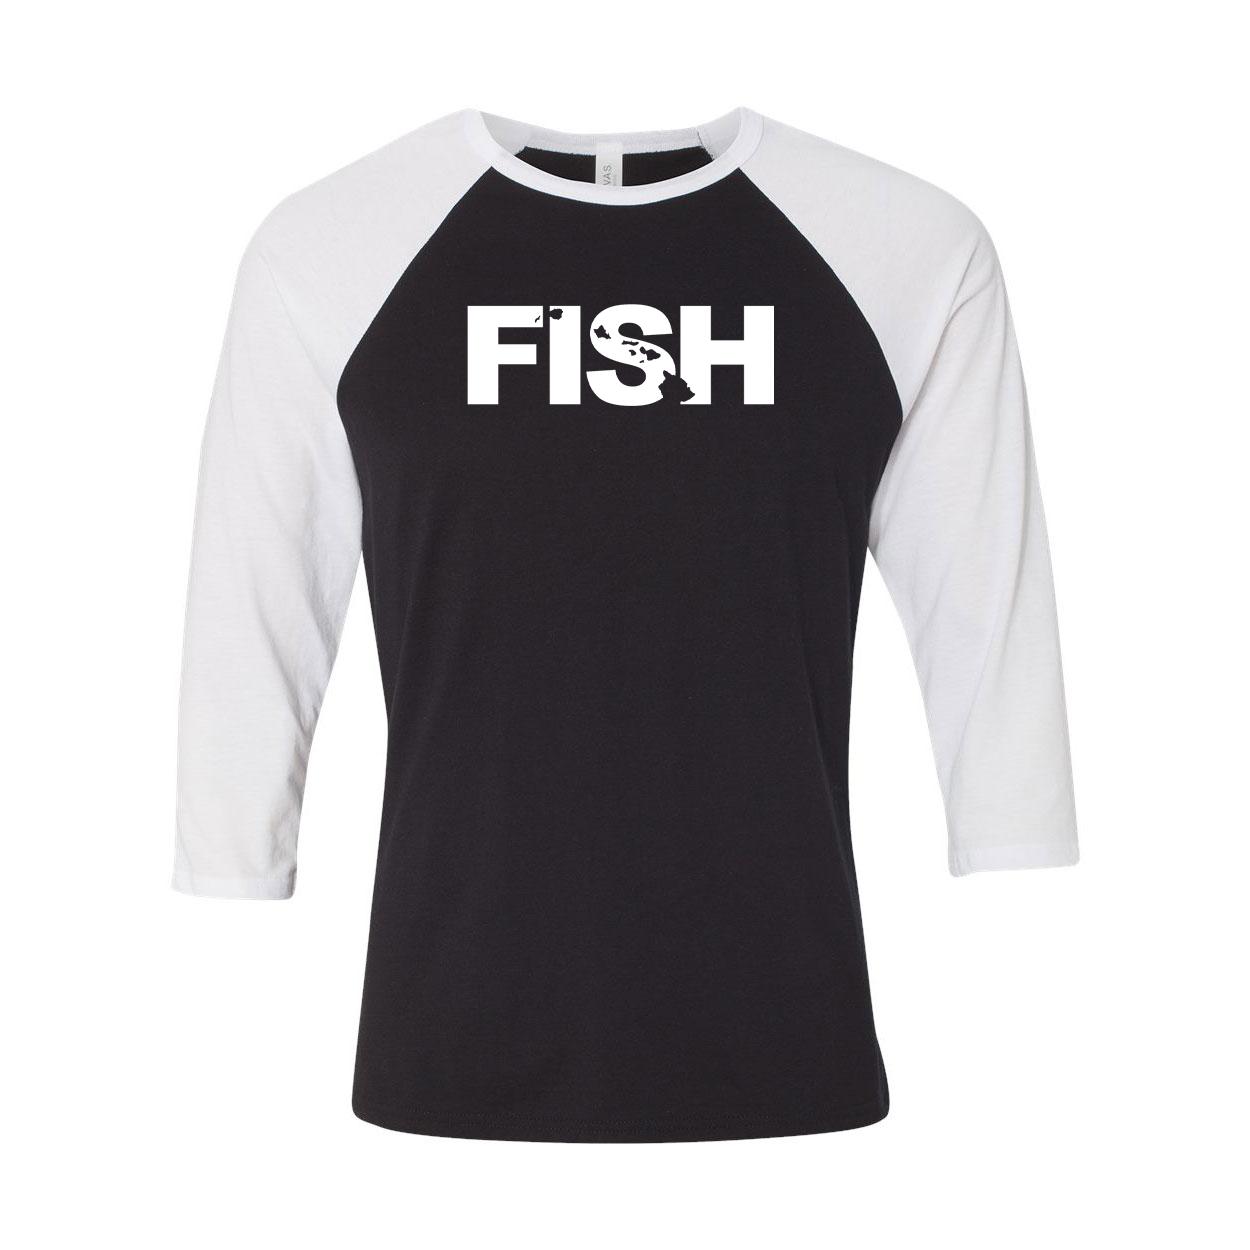 Fish Hawaii Classic Raglan Shirt Black/White (White Logo)